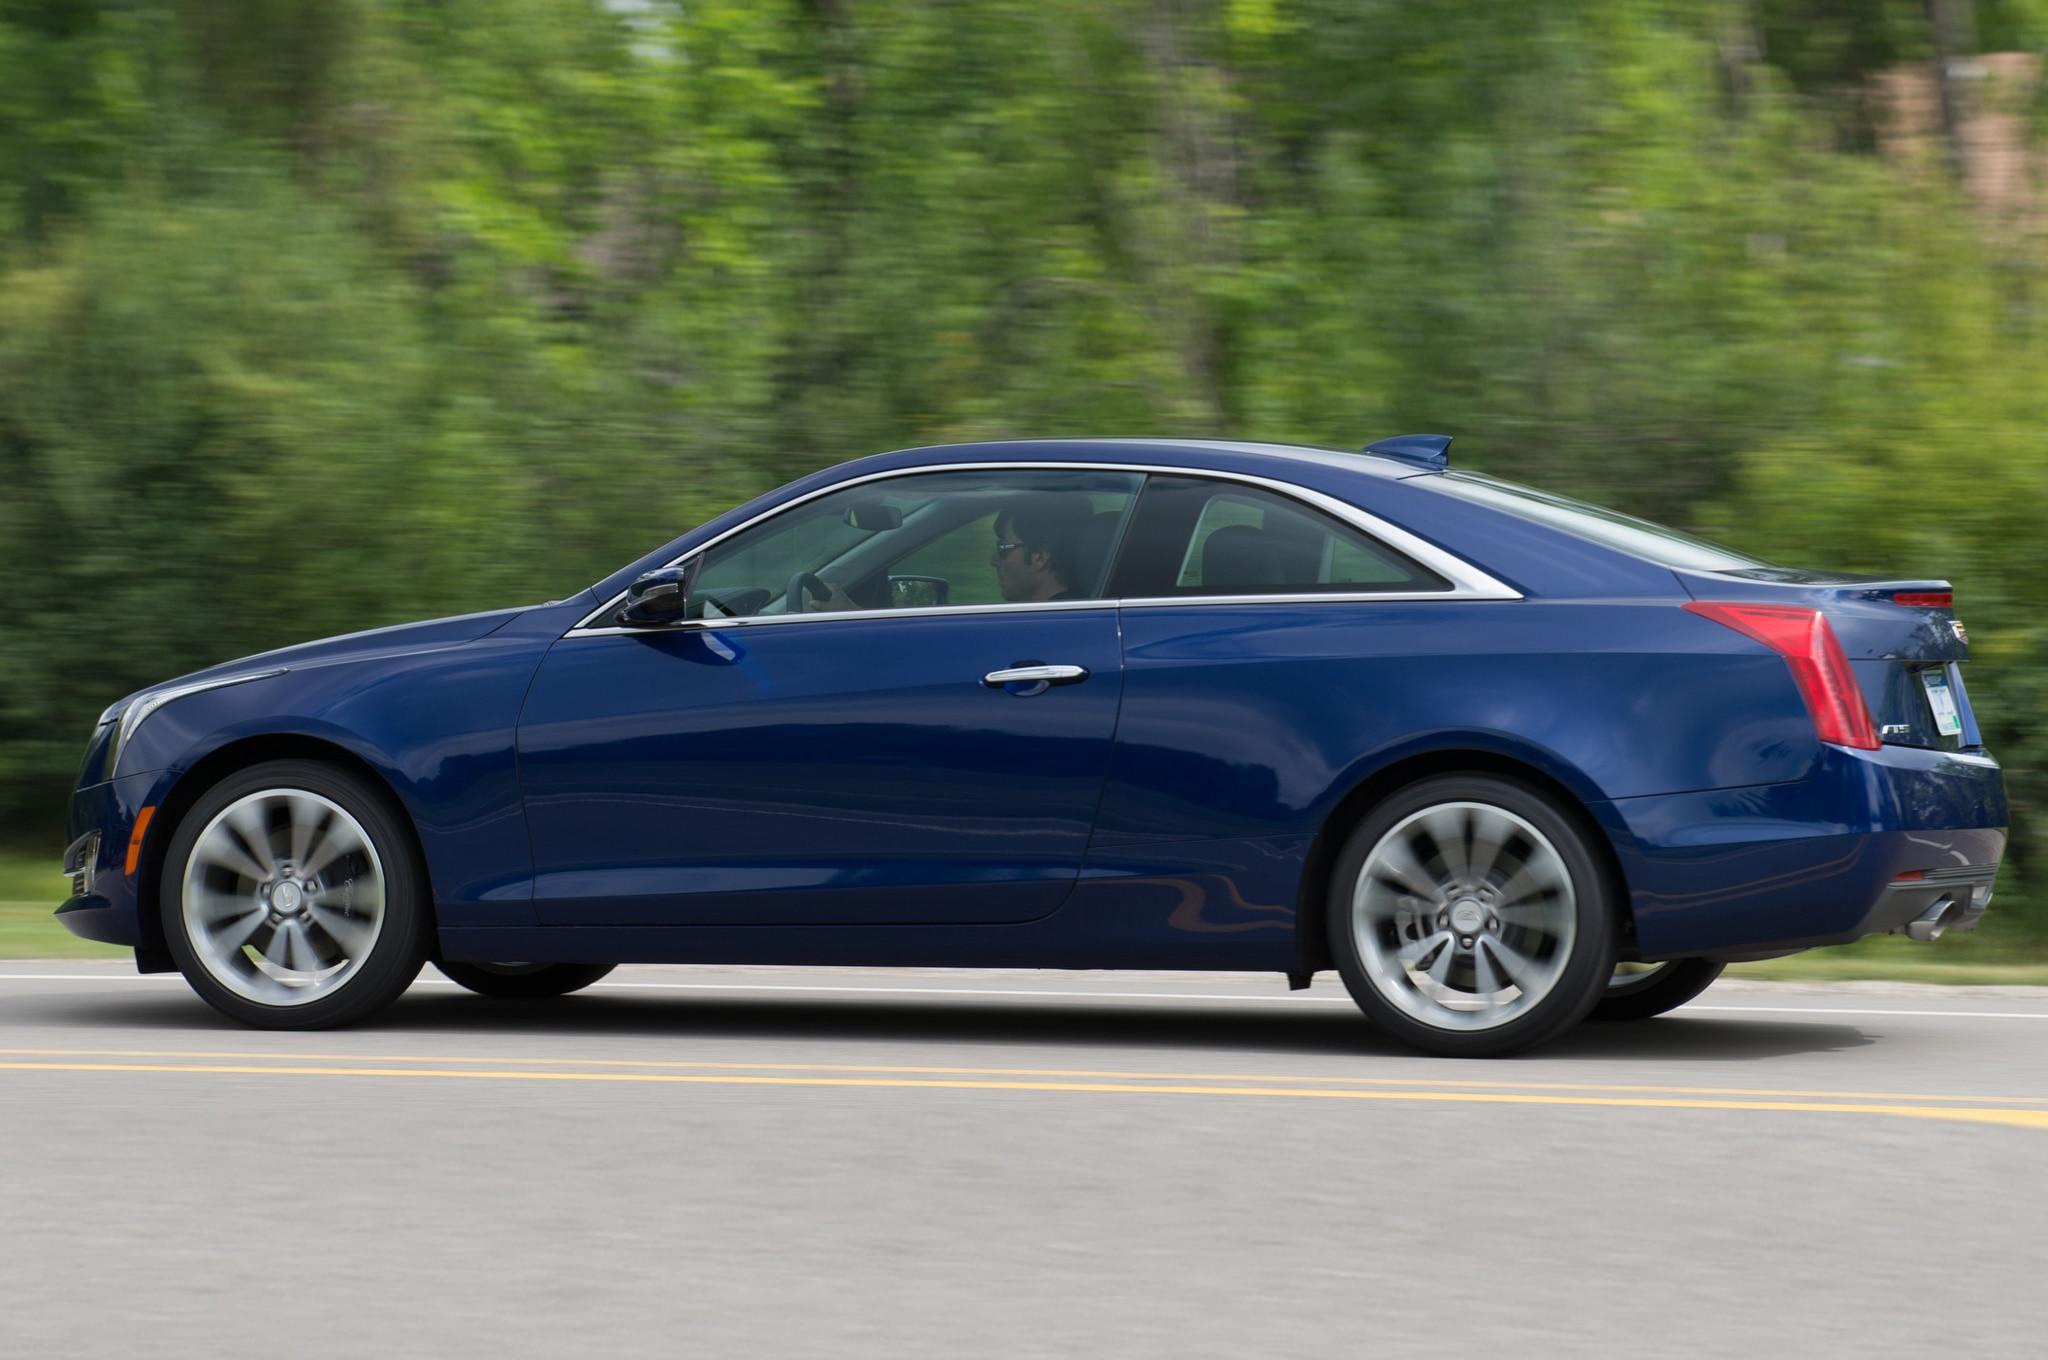 Cadillac Ats Coupe >> 2016 Cadillac Ats Coupe 3 6l Premium Review